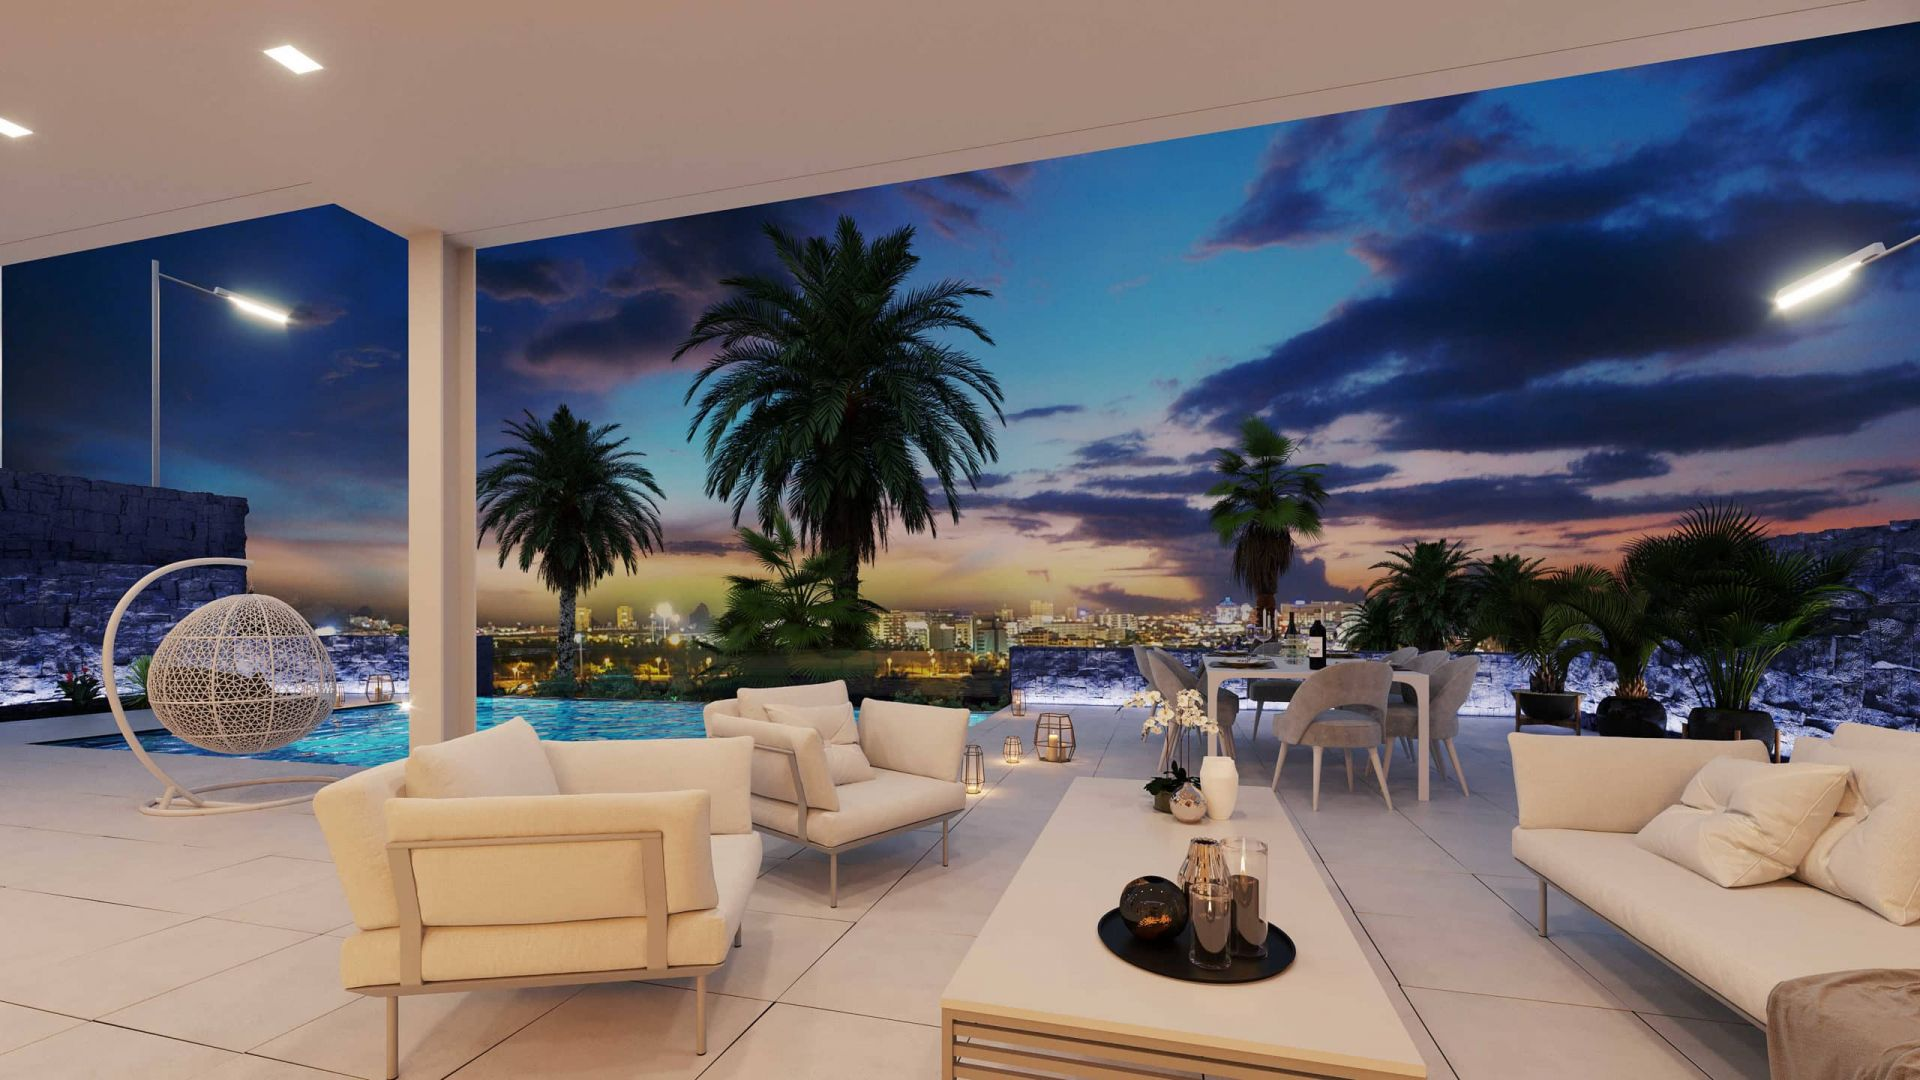 Serenity Luxury Villas Tenerife - img 2.